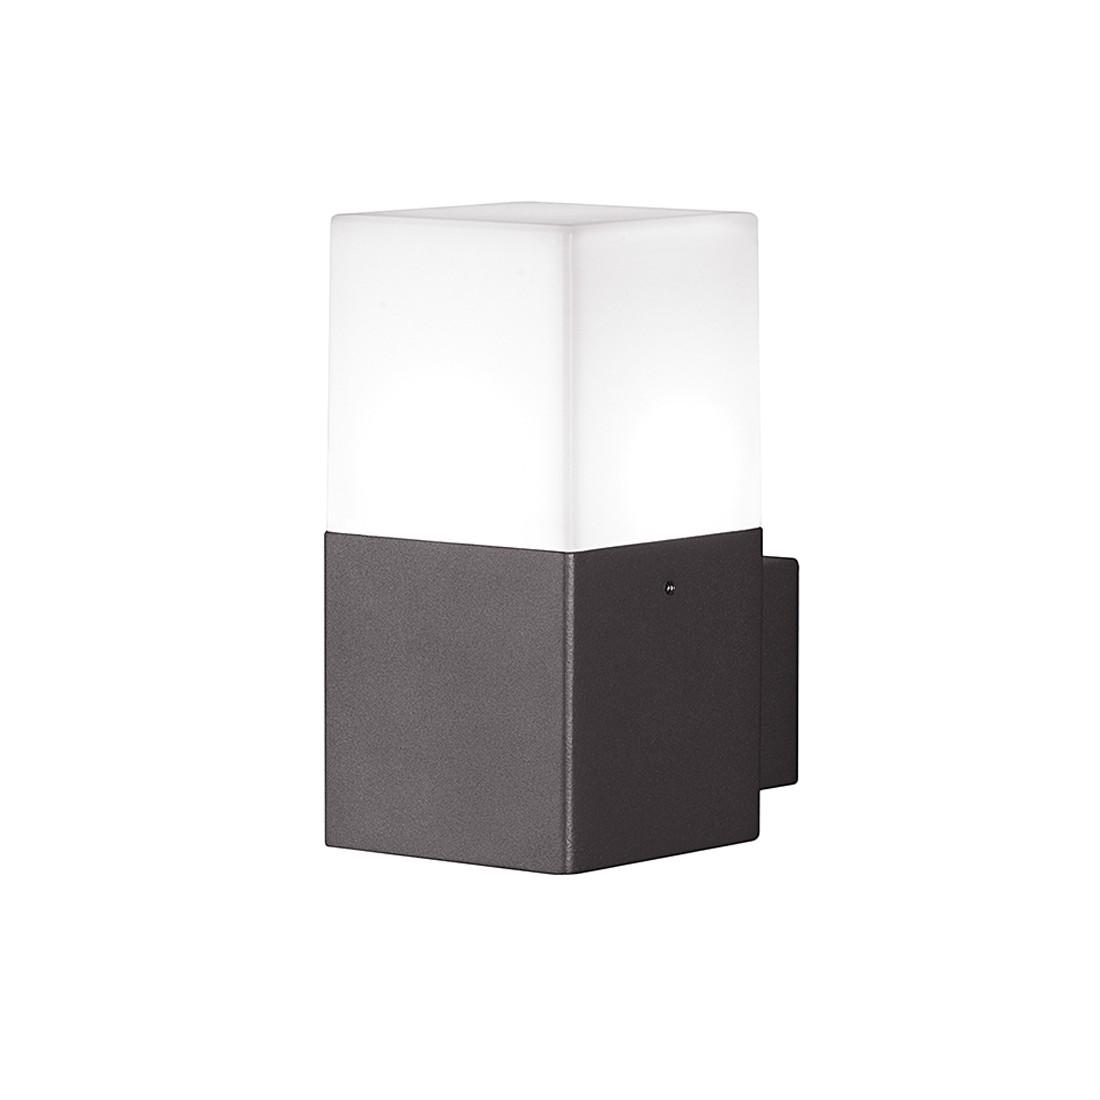 EEK A++, LED-Außenleuchte Hudson 1-flammig - Aluminium Kunststoff - Silber, Trio